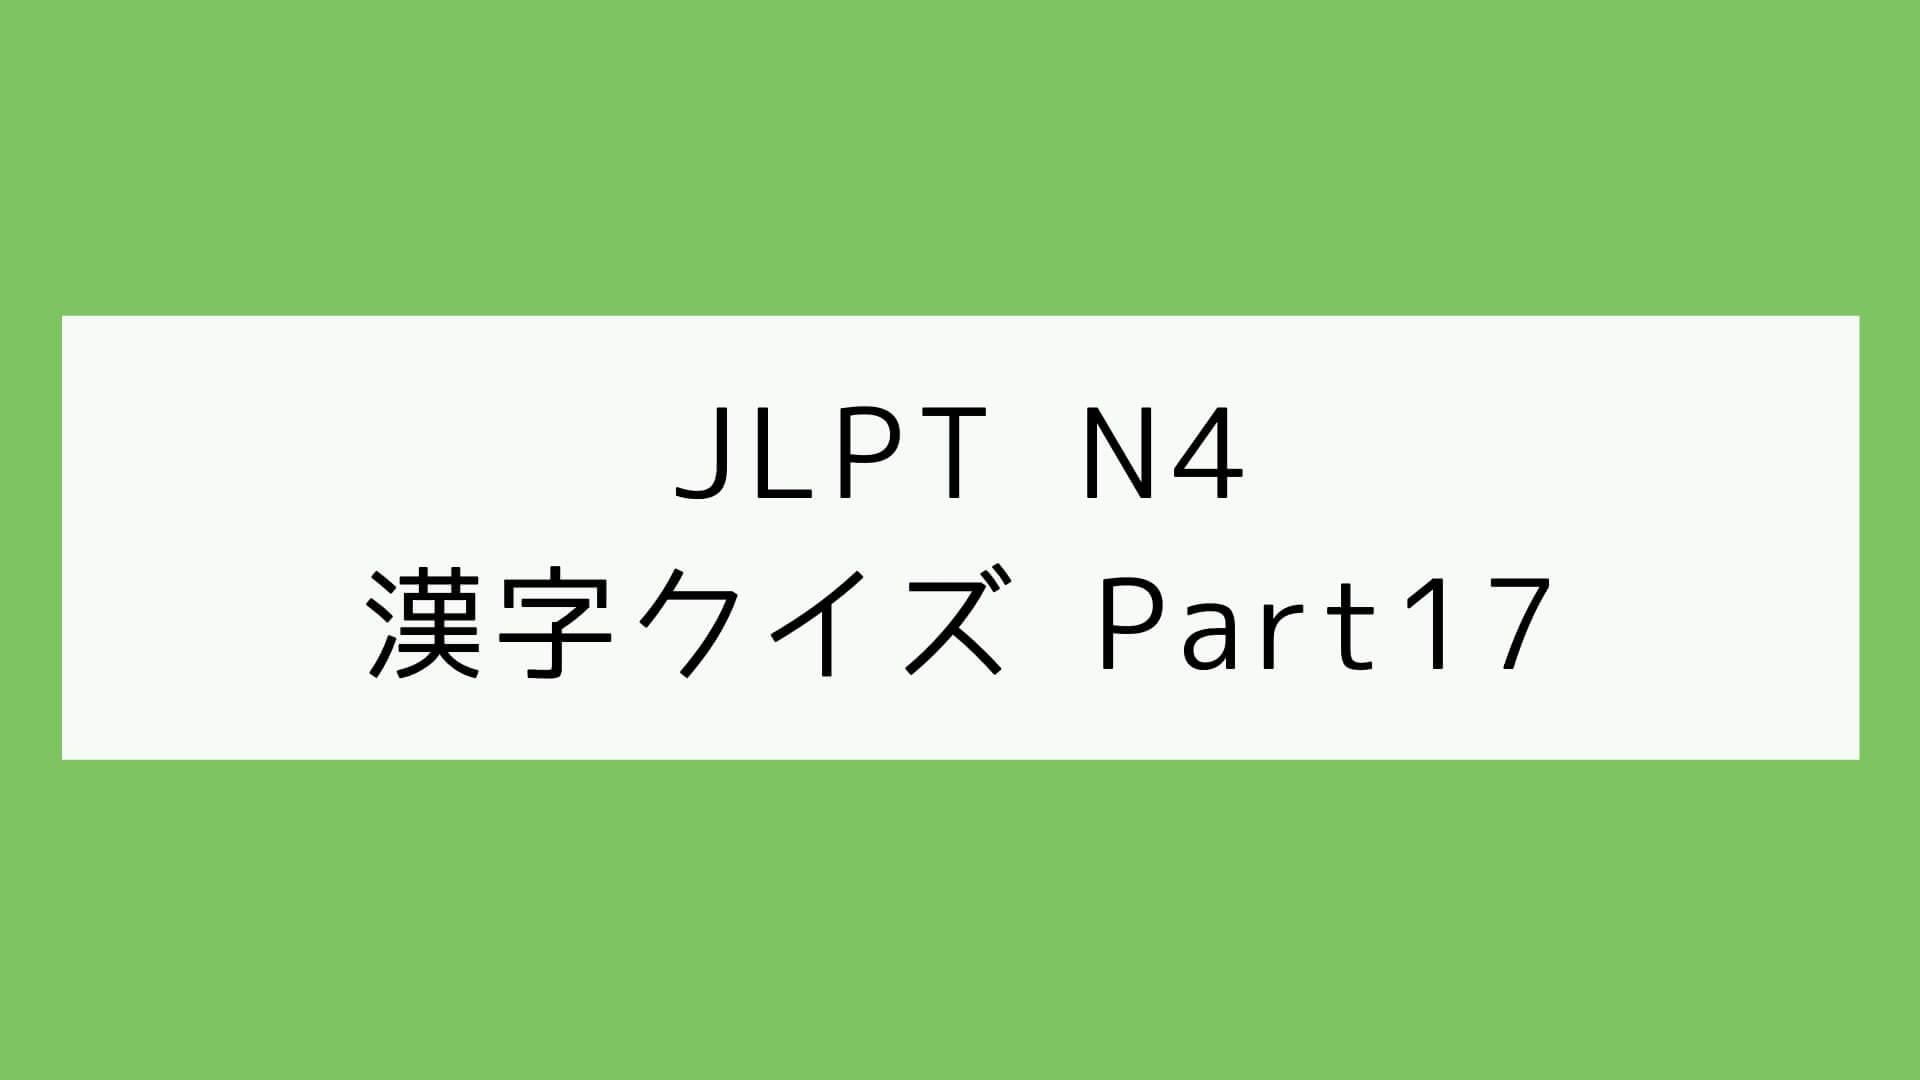 【JLPT N4】漢字クイズ Part17